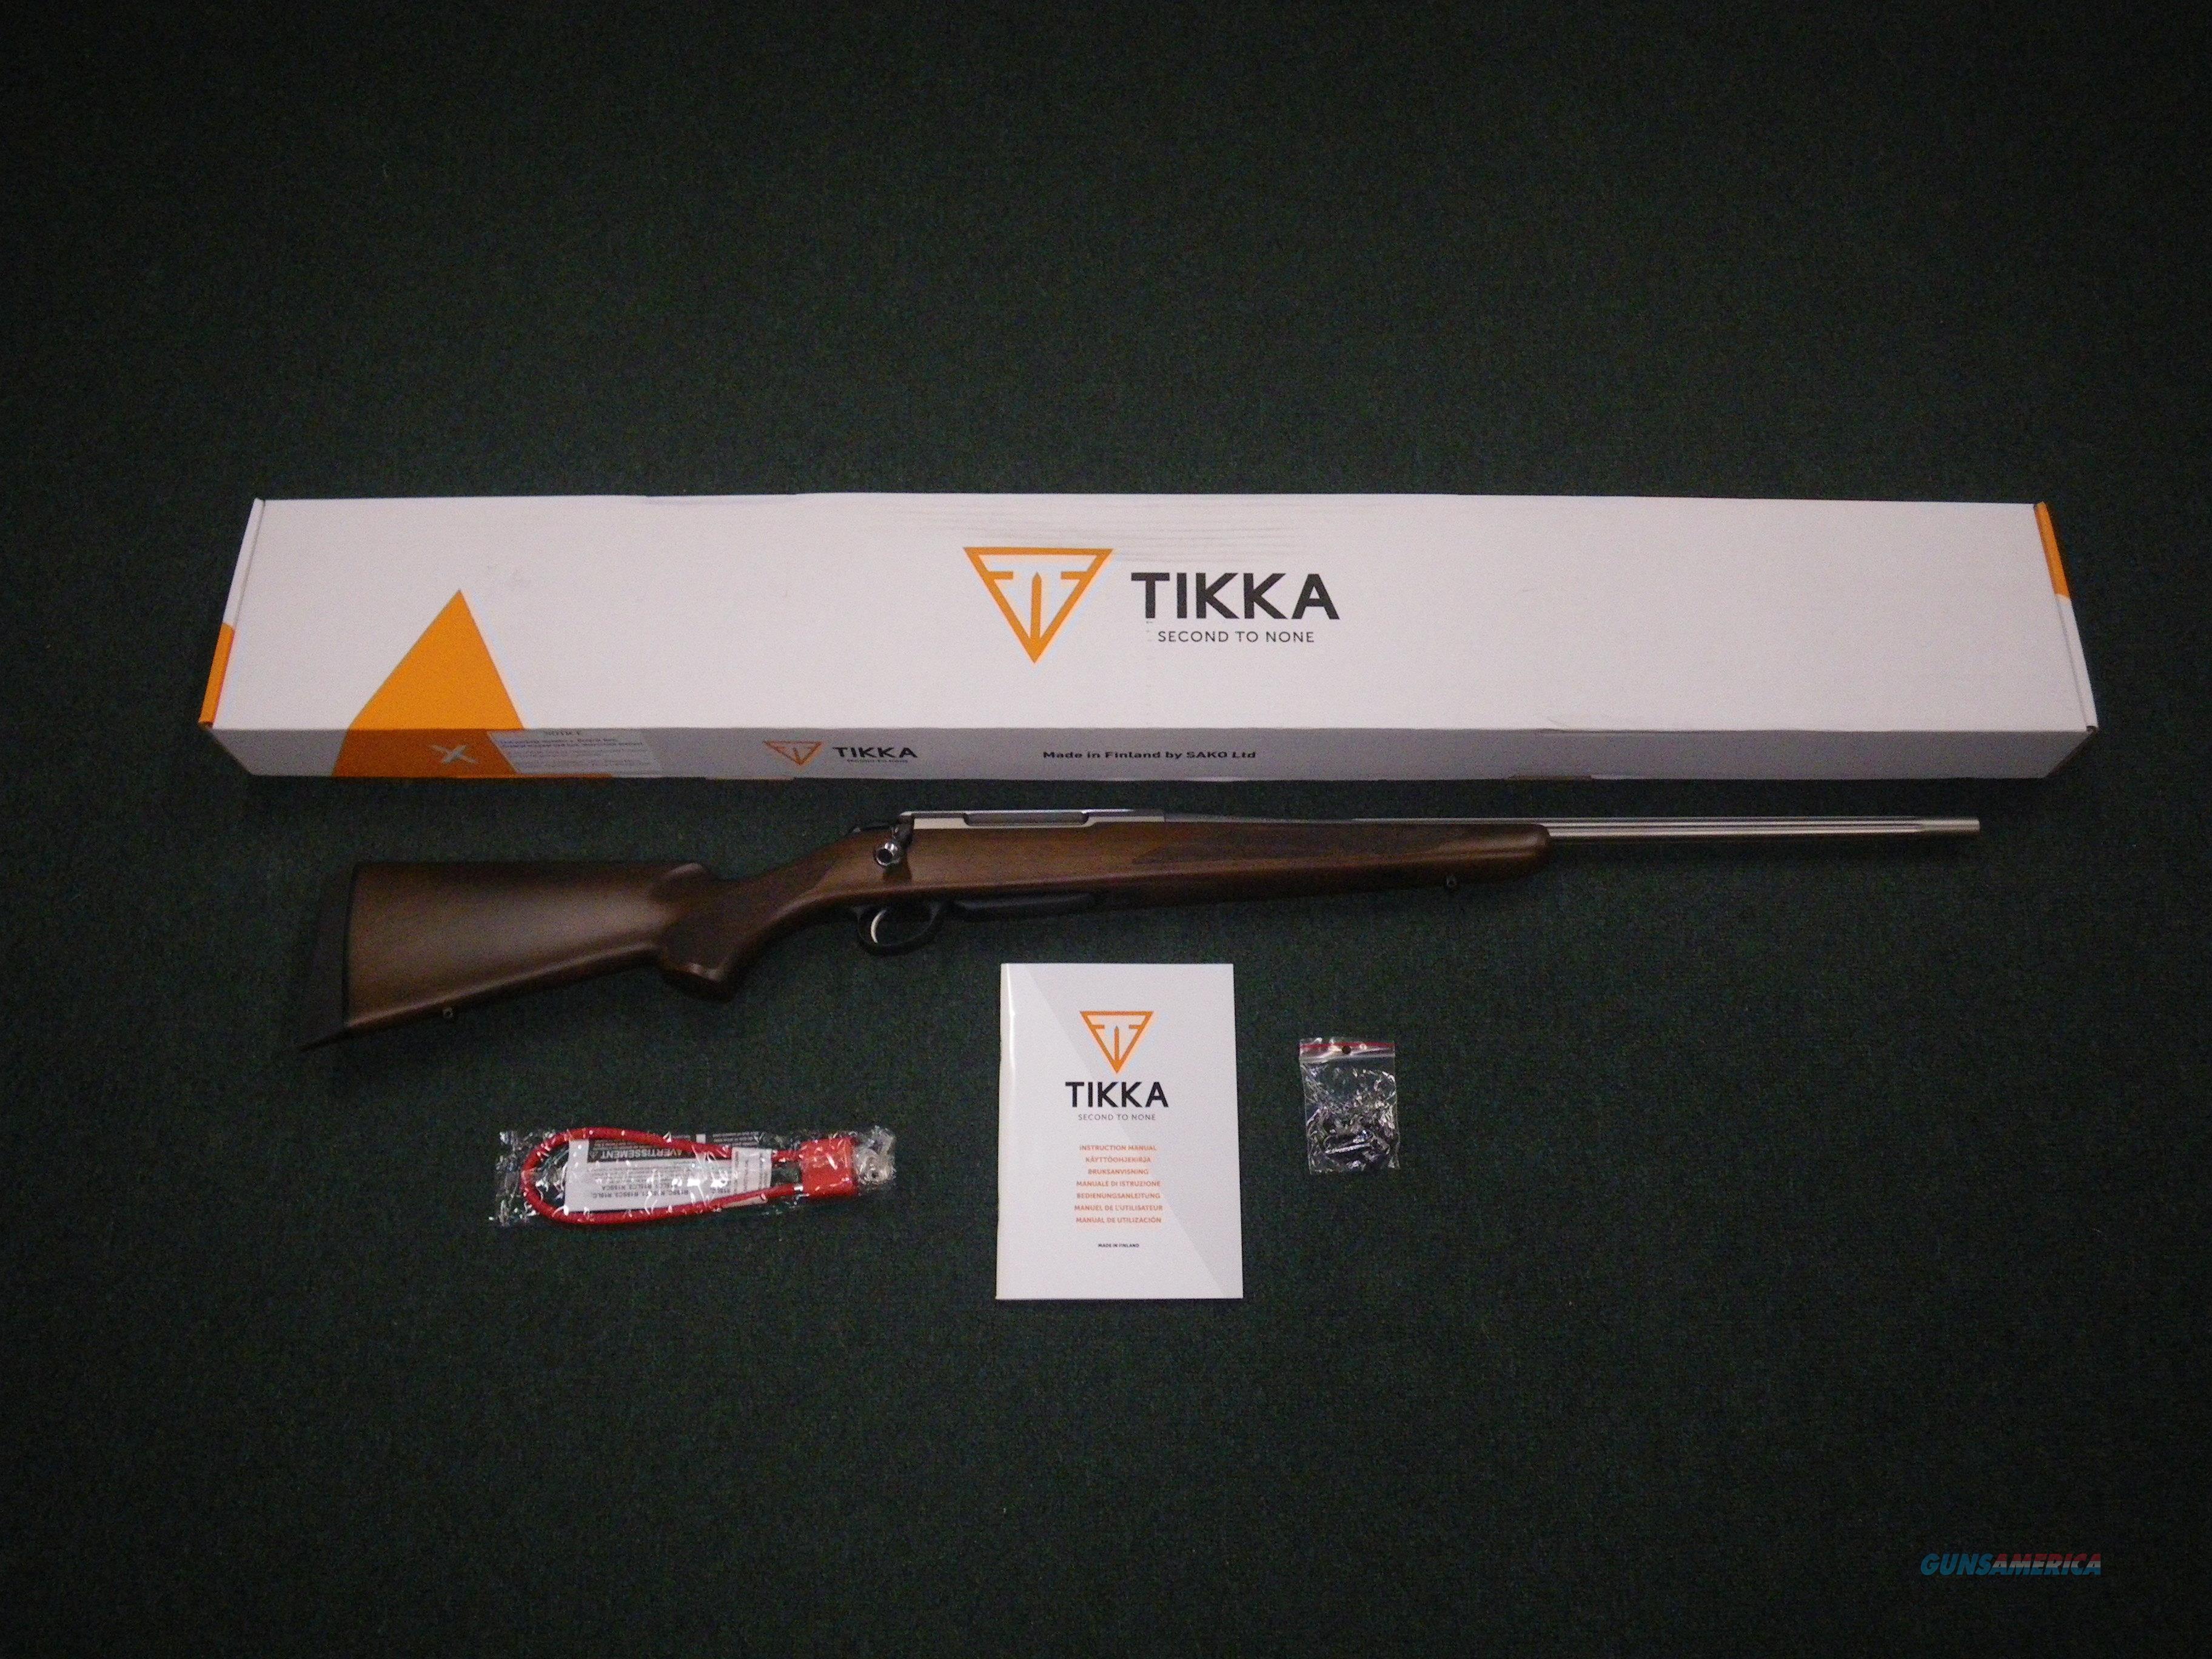 "Tikka T3x Hunter Stainless 308 Win 22.4"" NEW #JRTXA716  Guns > Rifles > Tikka Rifles > T3"